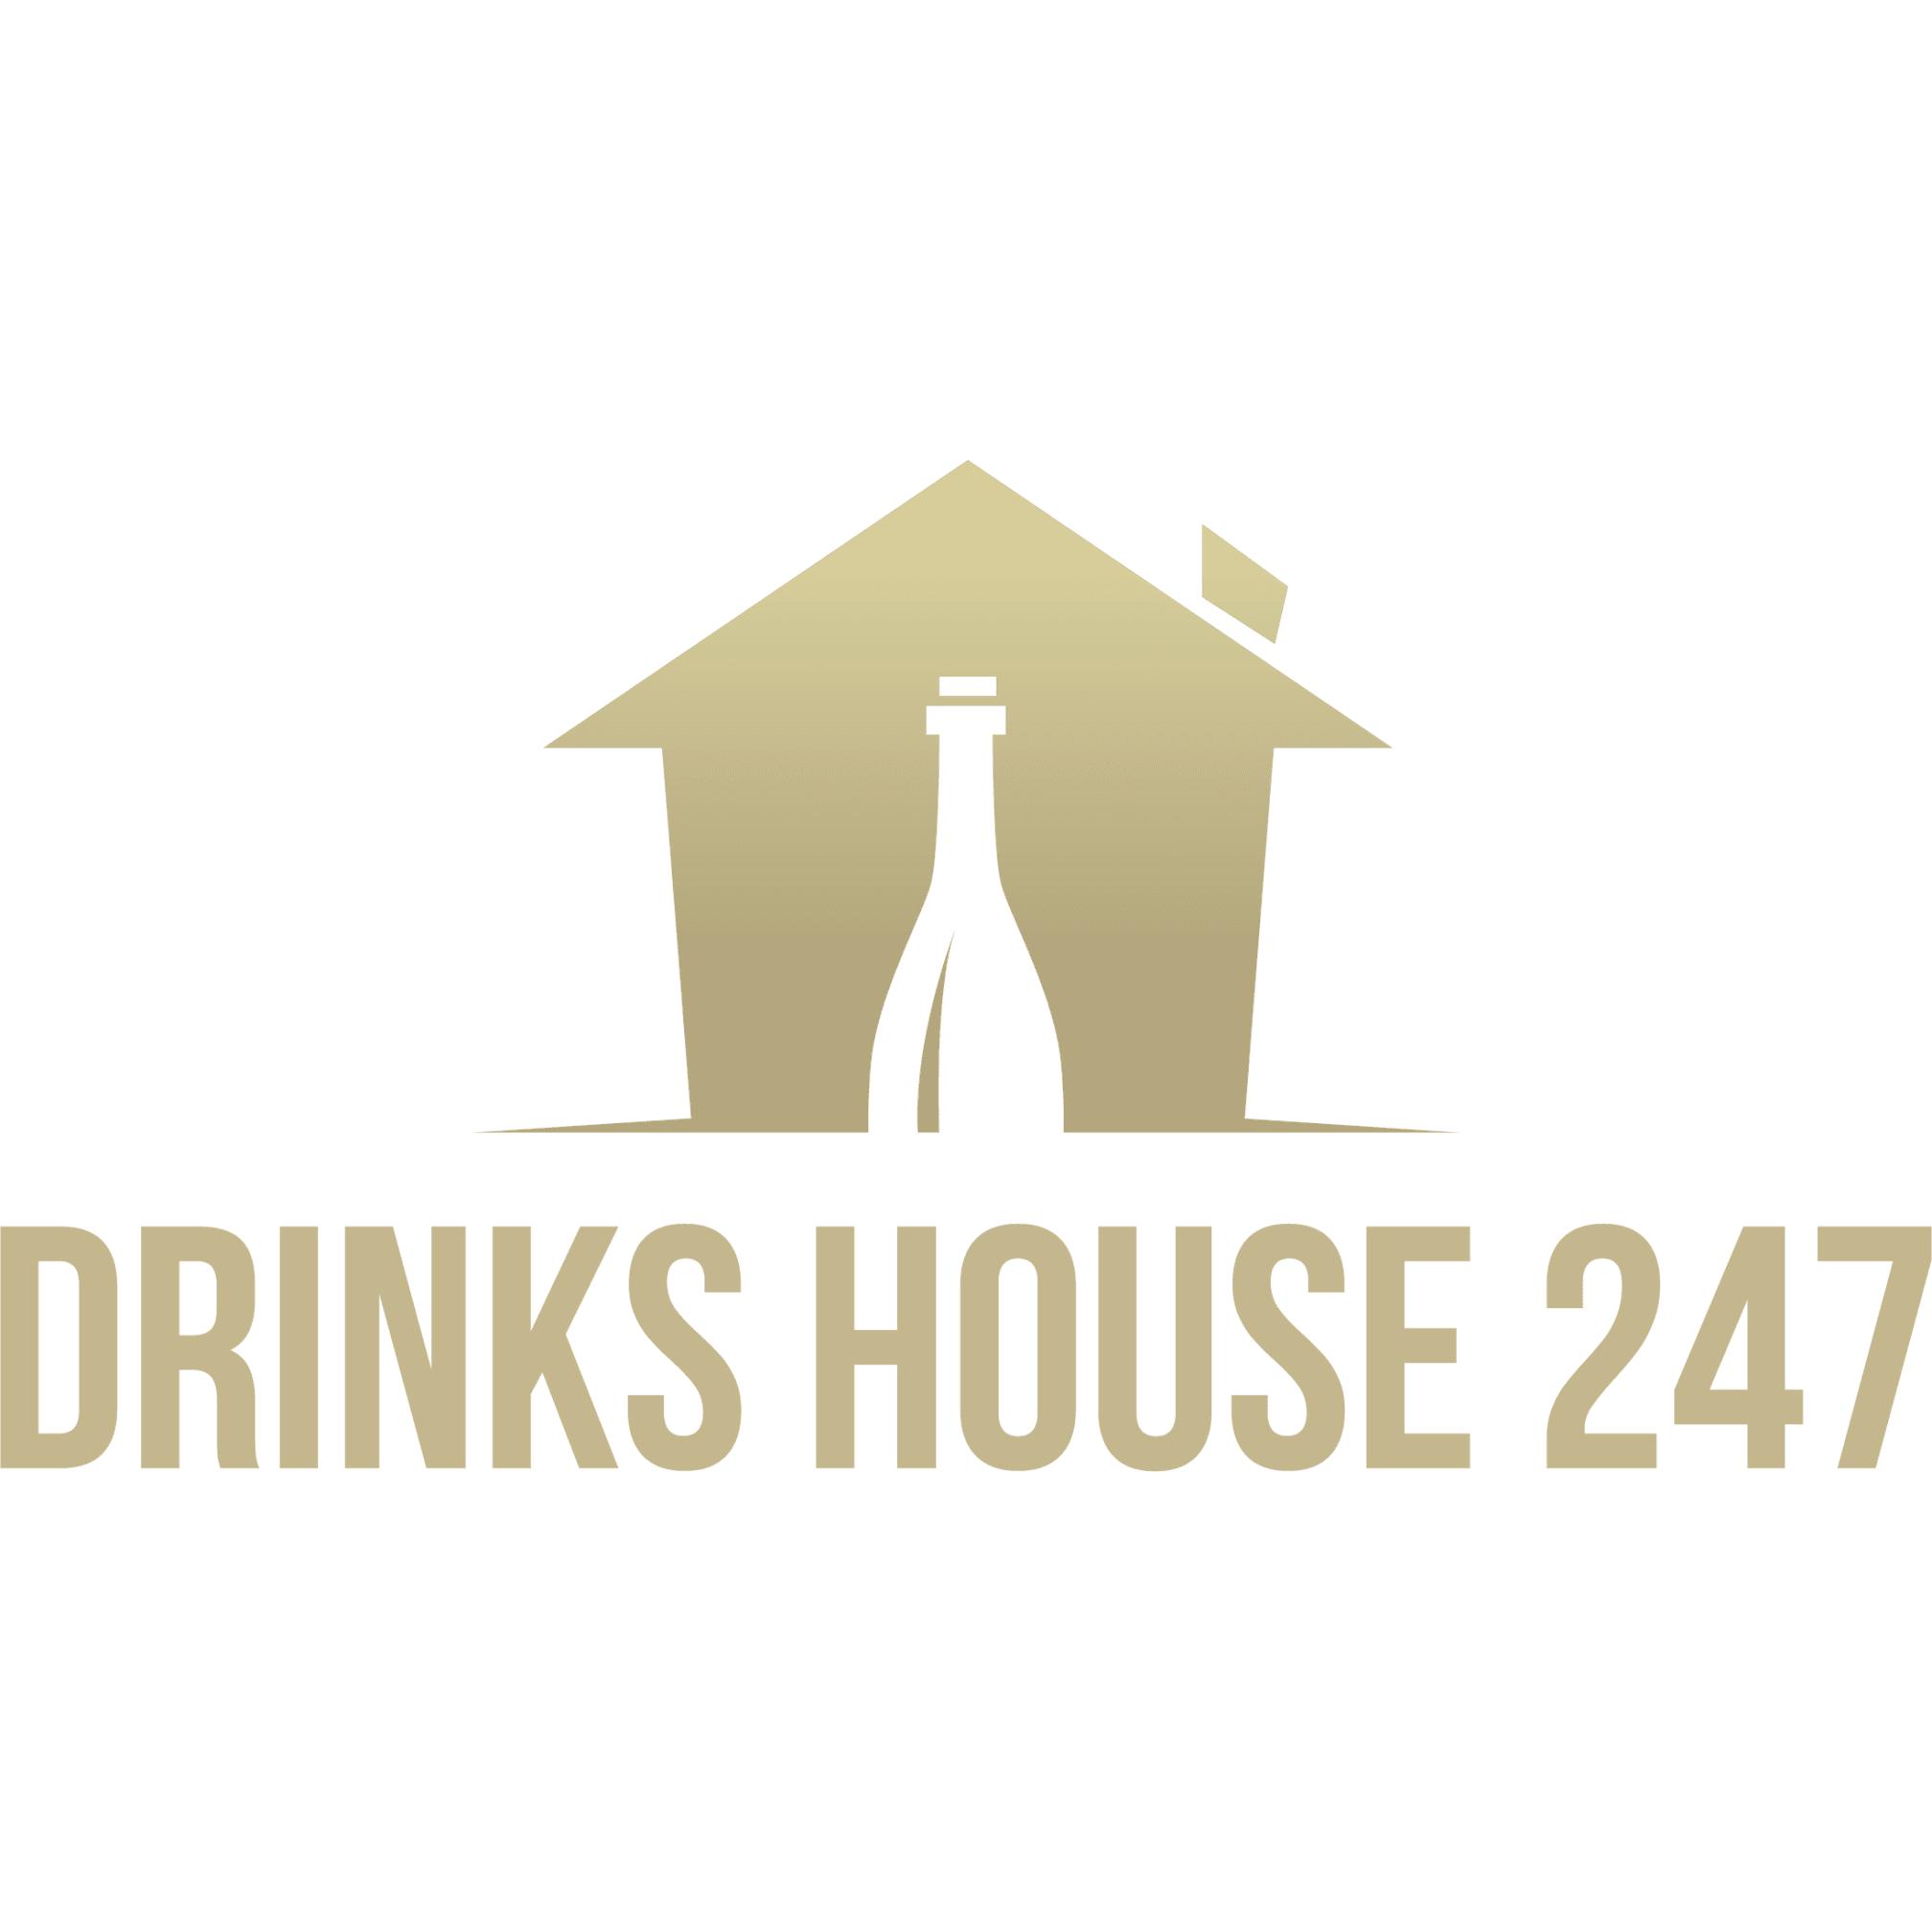 Drinks House 247 Ltd - London, London SW11 5QL - 020 3393 8809 | ShowMeLocal.com